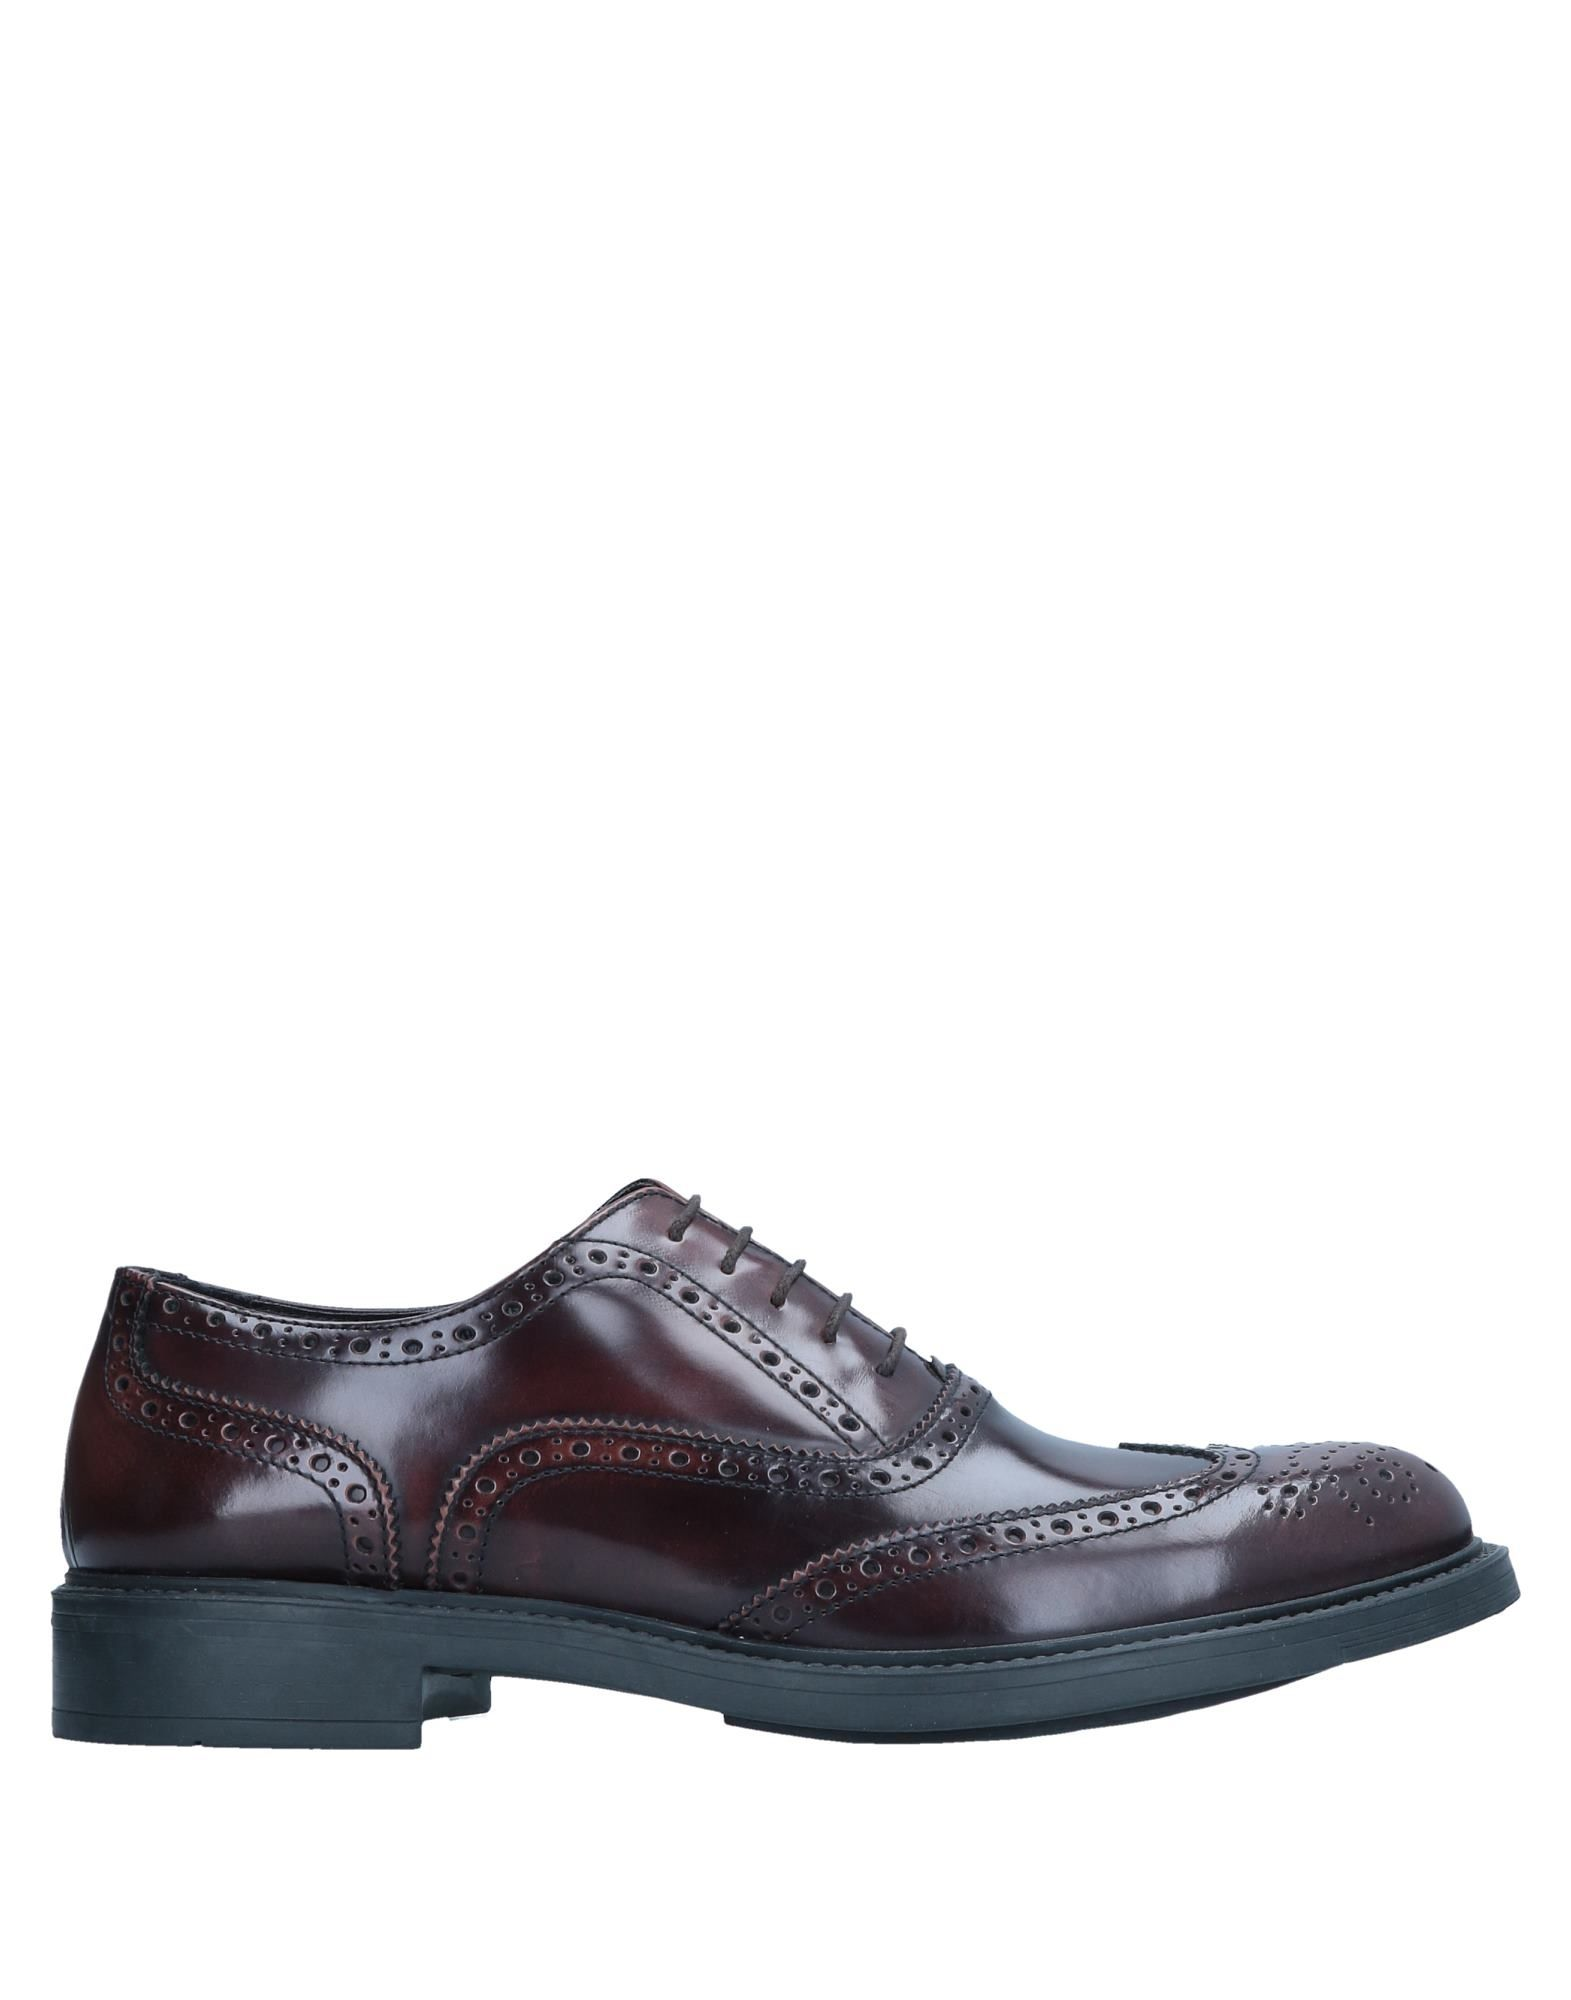 Rabatt echte Schuhe Adeep Schnürschuhe Herren  11556398BS